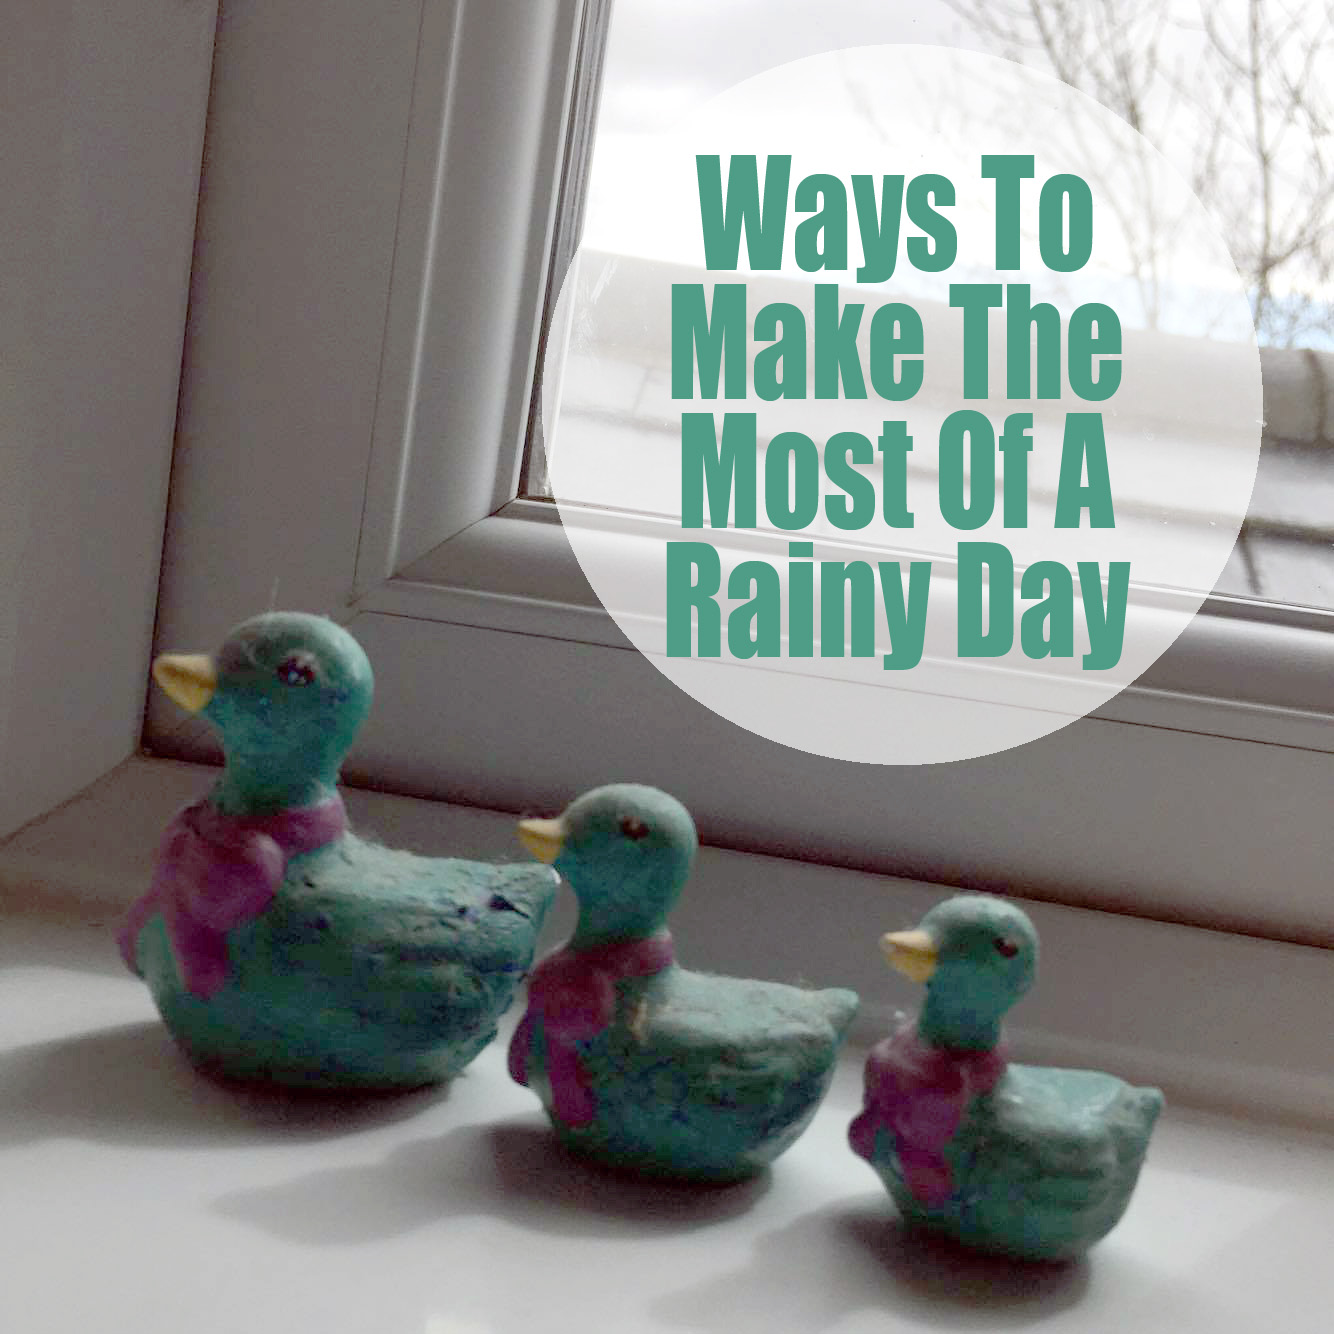 3 Ceramic Ducks In A Row.